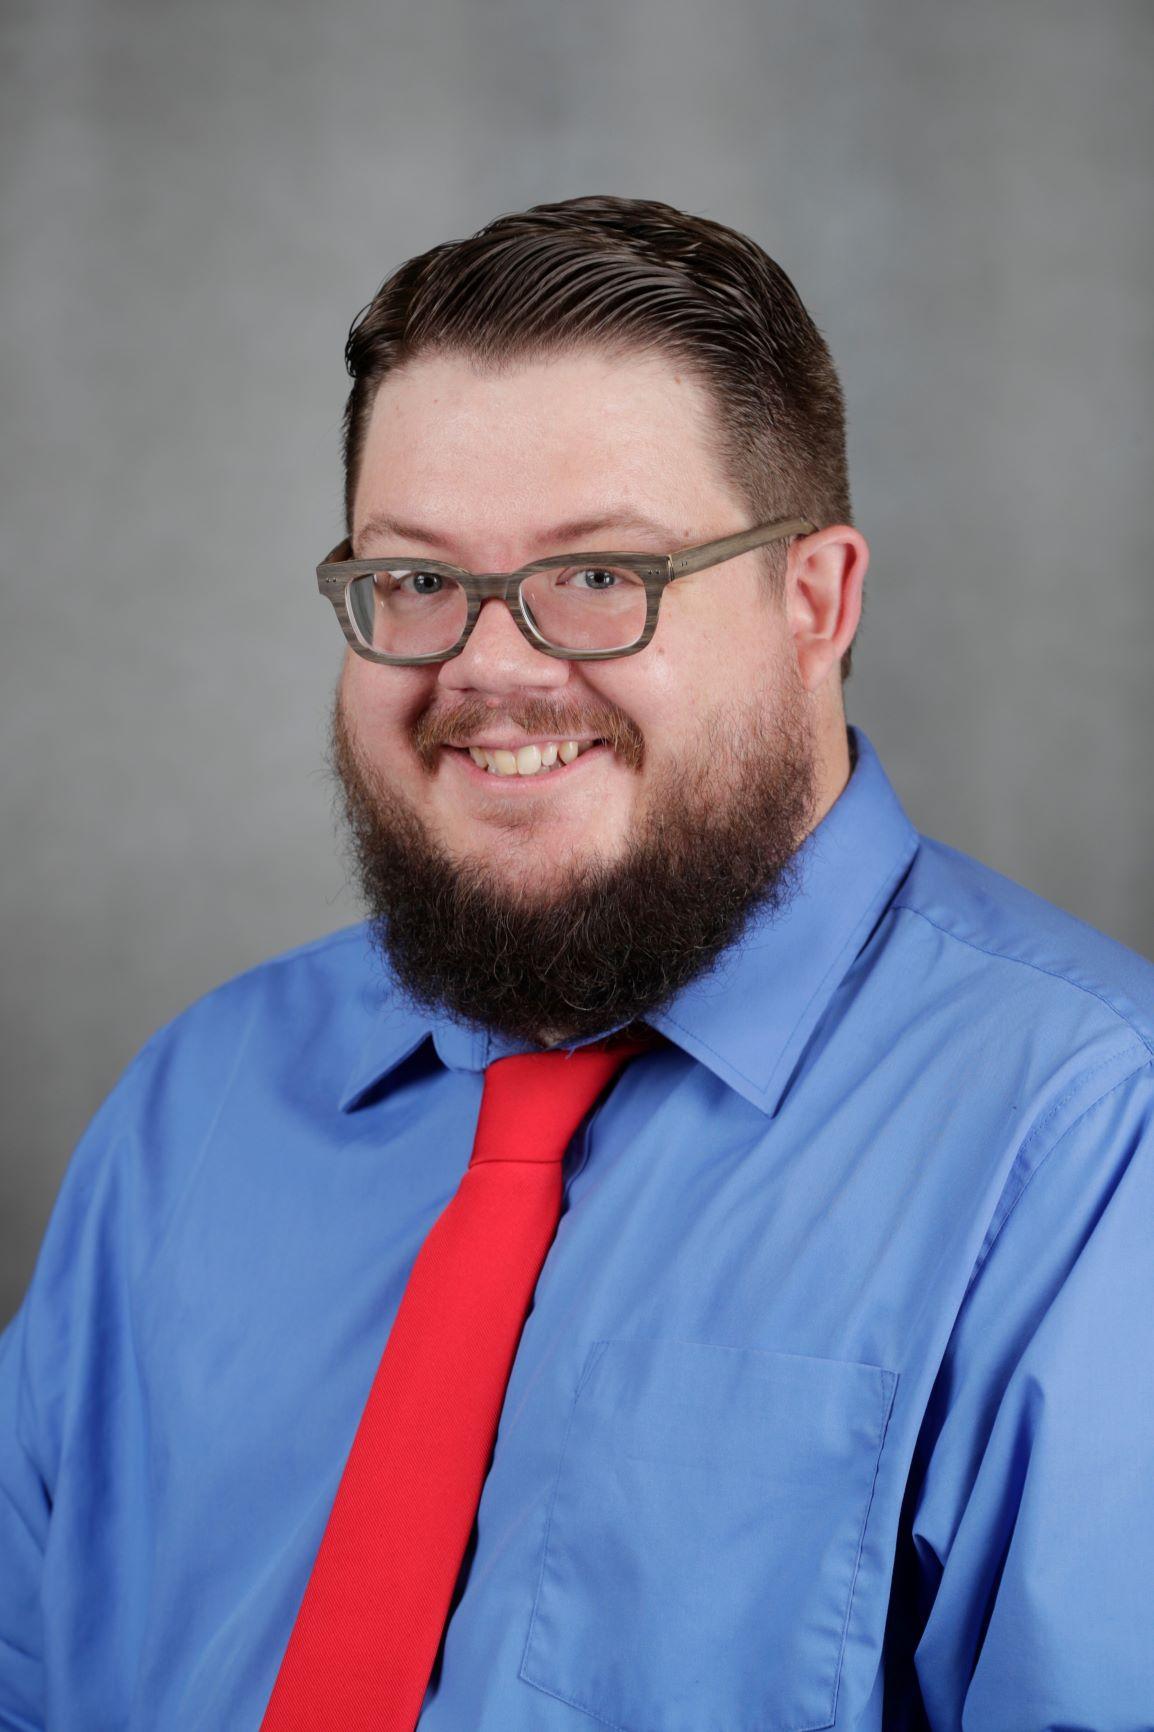 John Hall, Academic Advisor